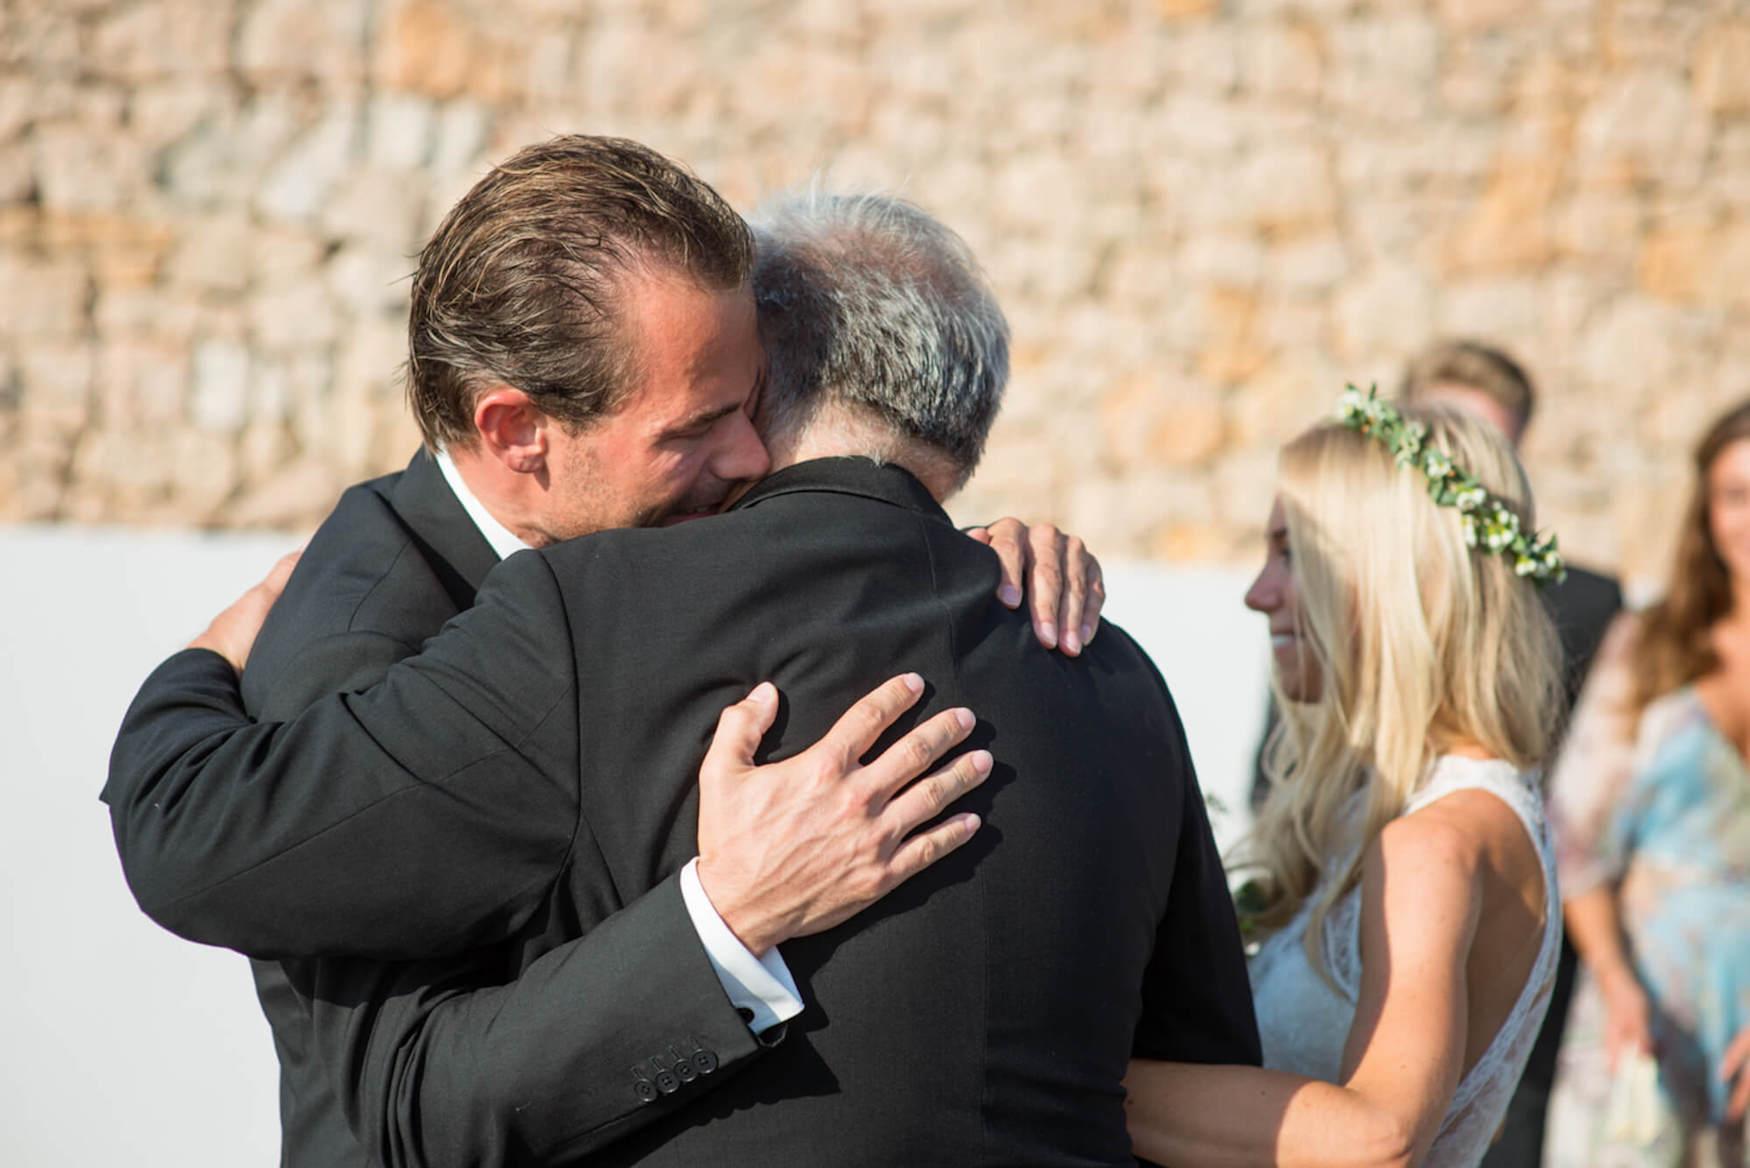 bride groom sunset ceremony father of bride tears black tie flower crown pronovias dress